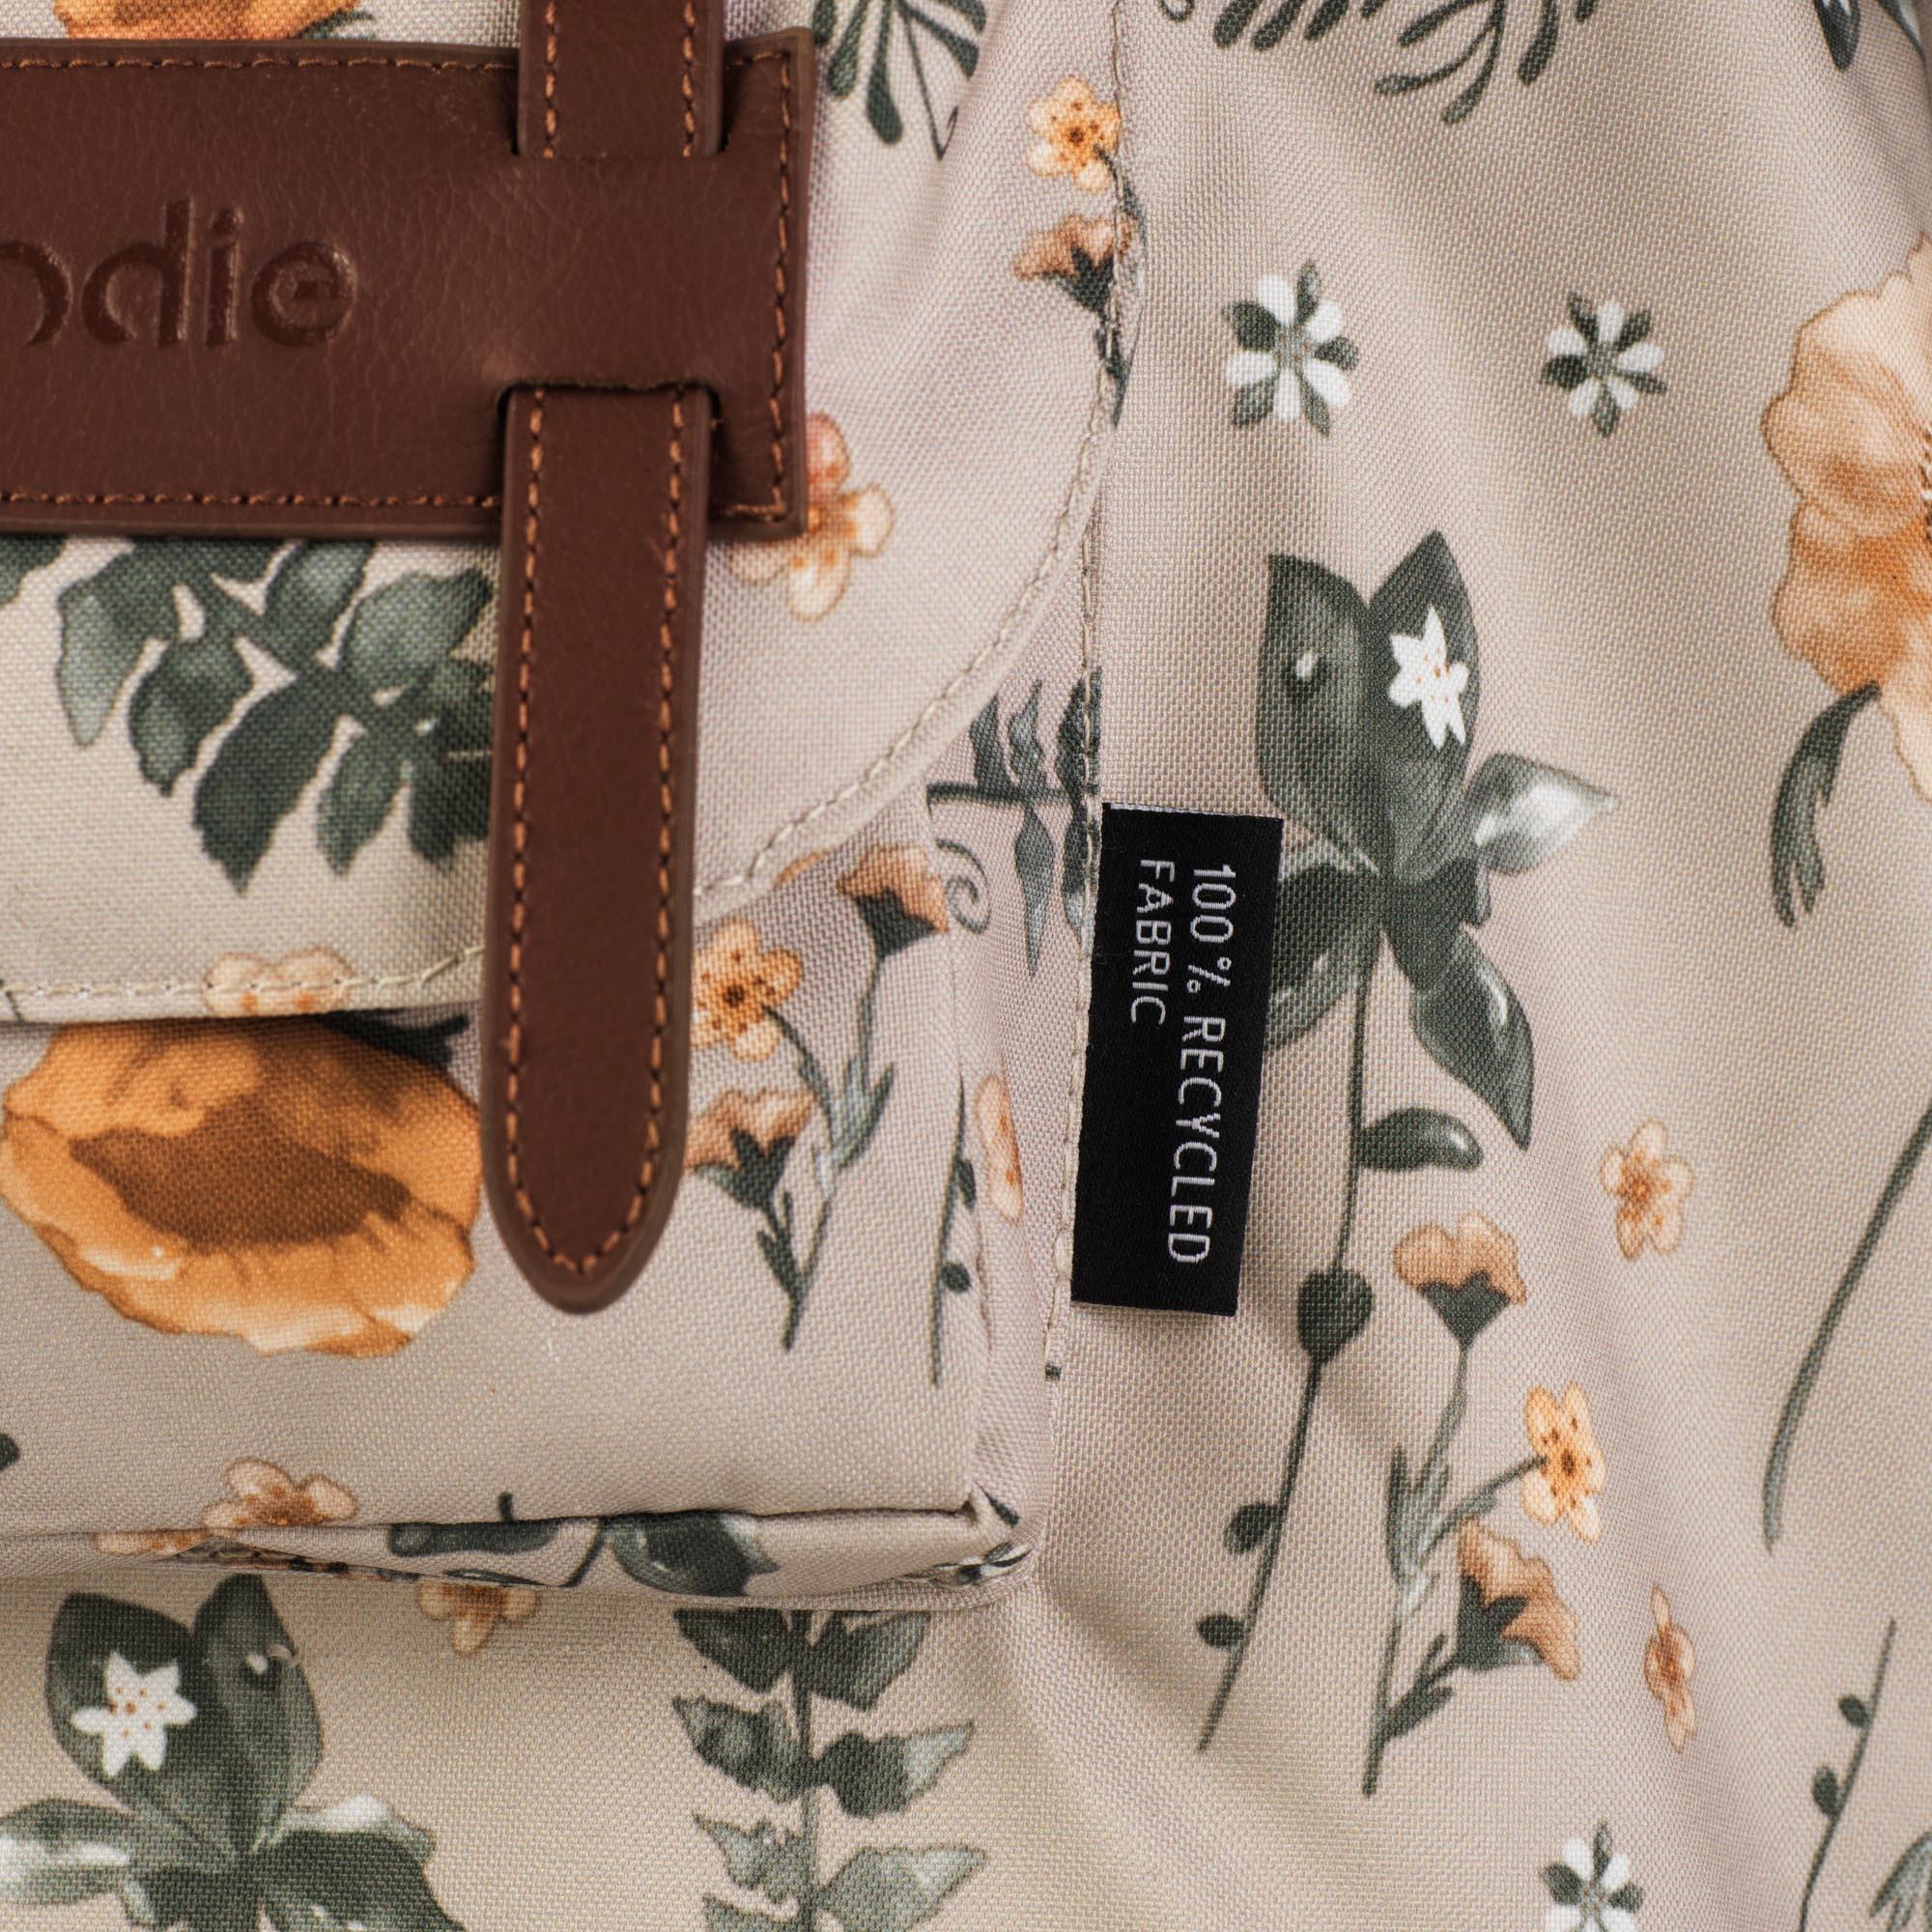 Elodie Details Elodie Mondo Compacte Buggy Meadow Blossom